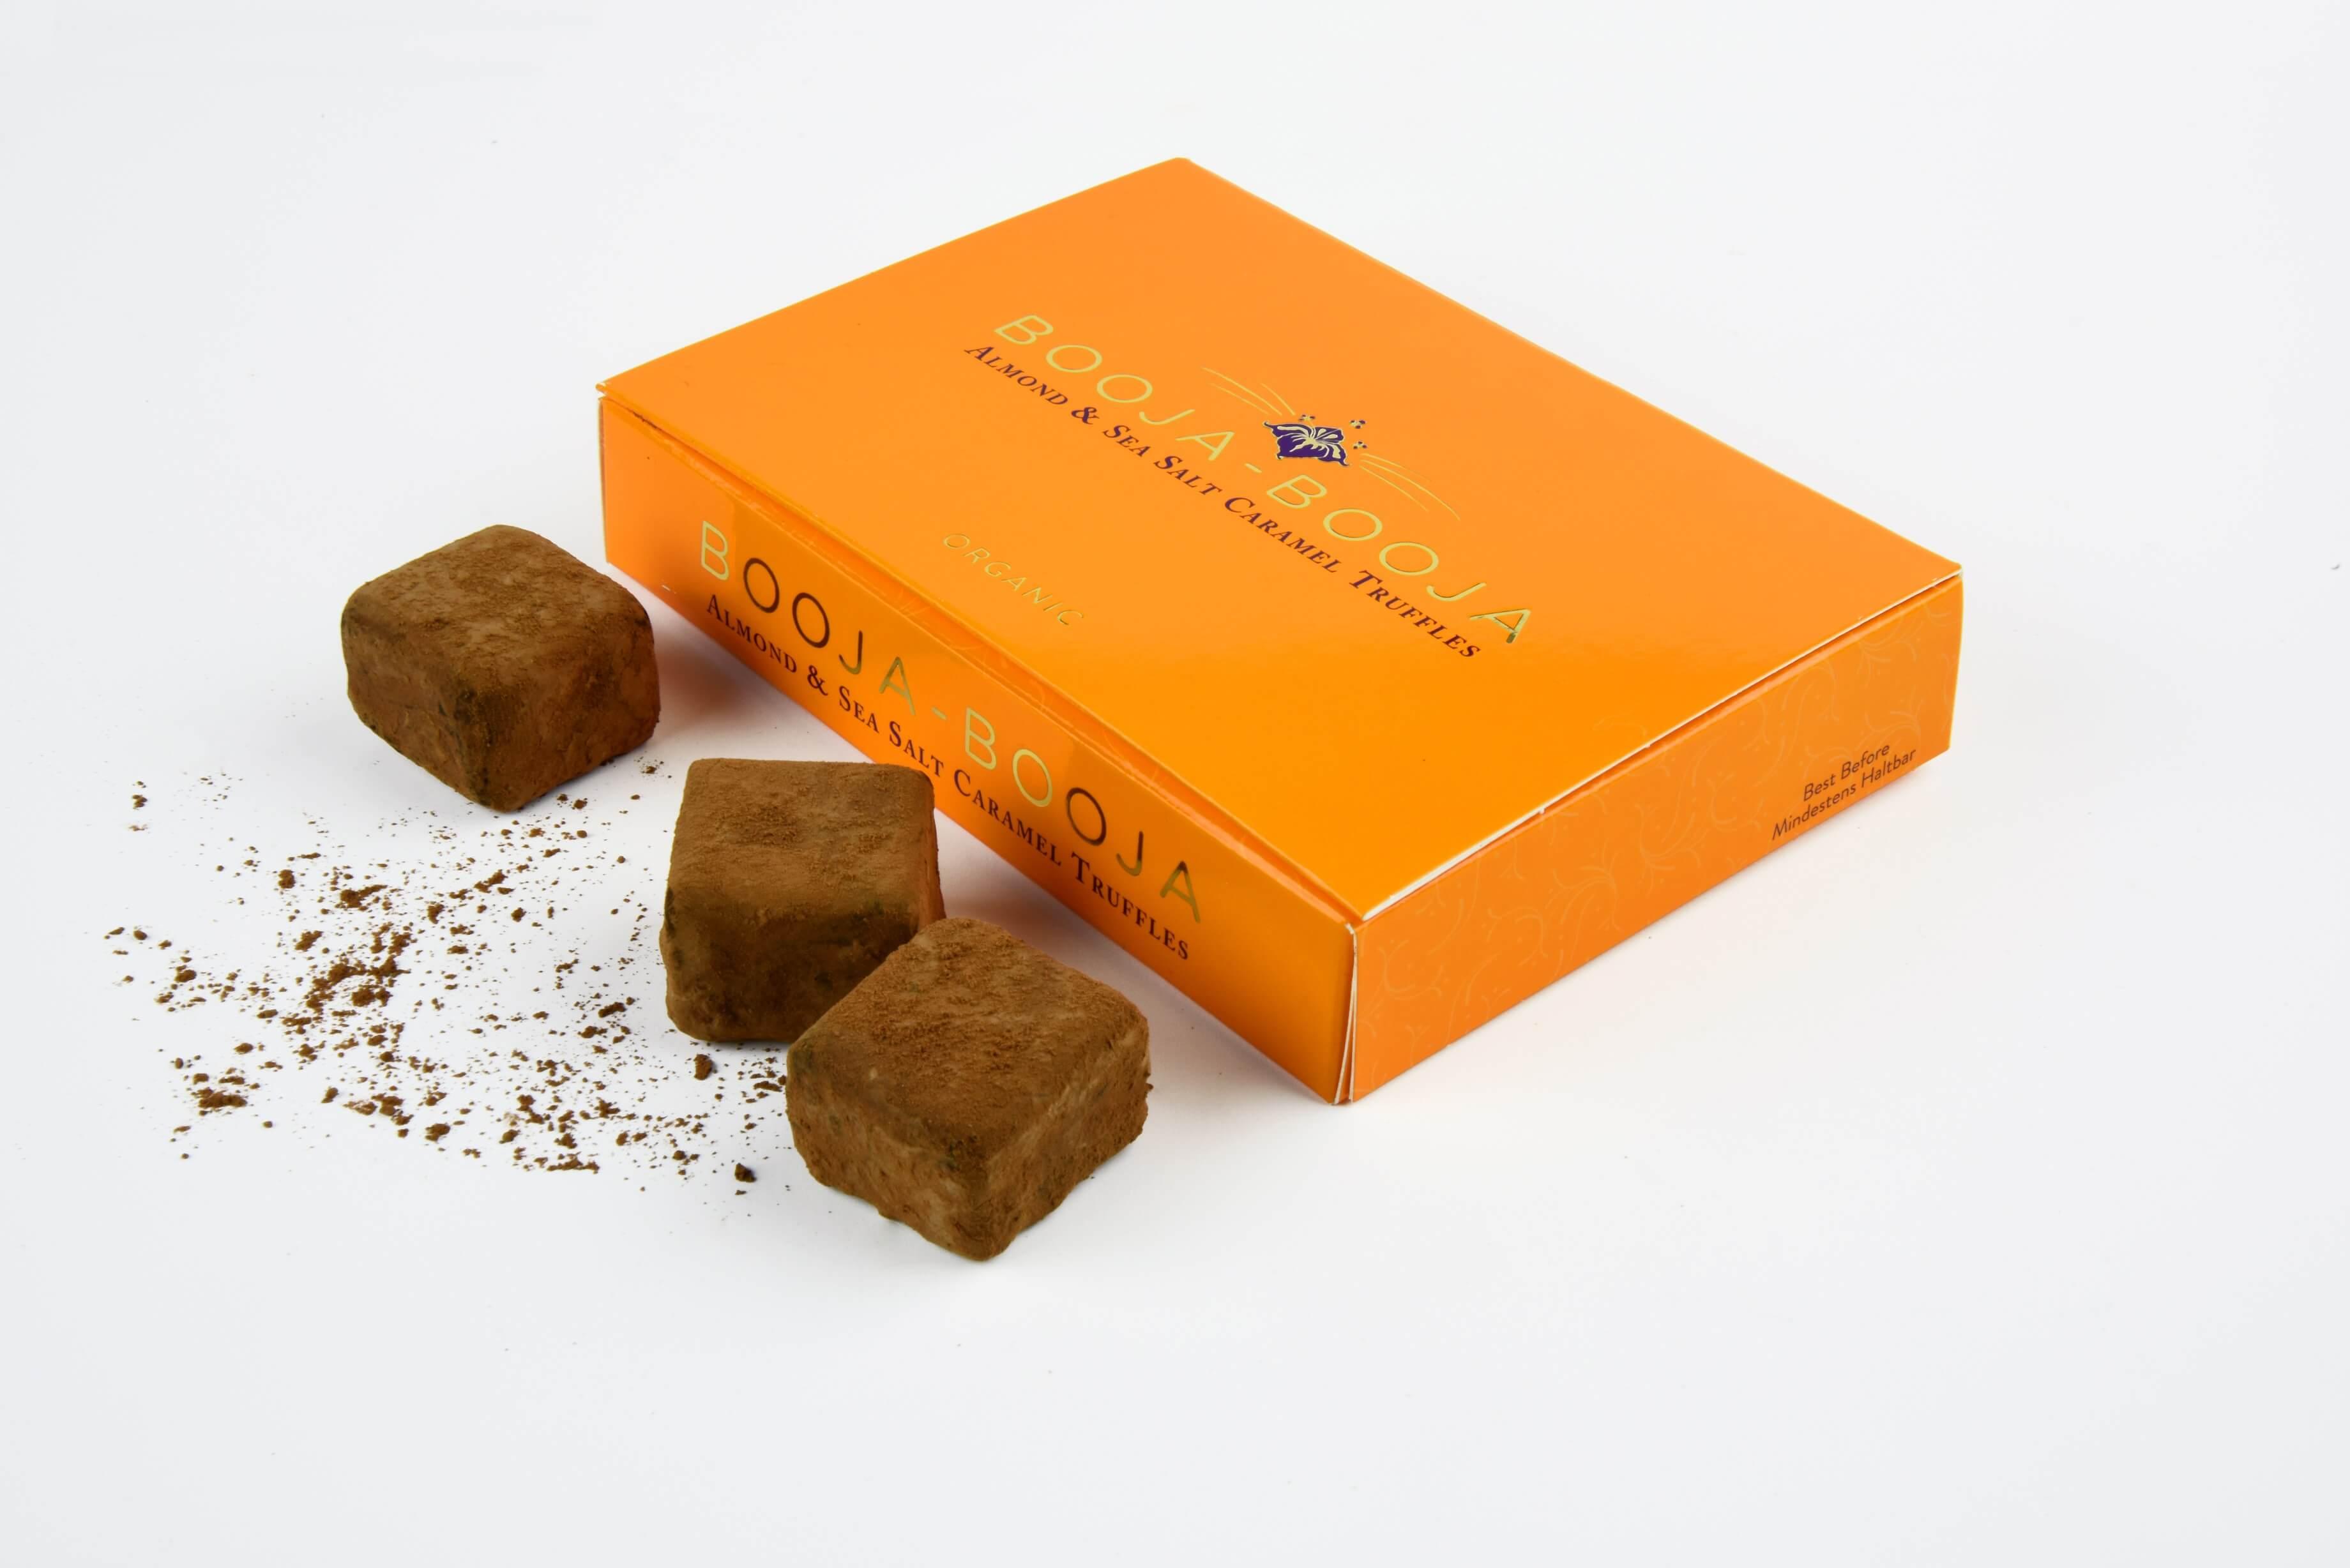 Booja Booja Chocolates Nab Peta Vegan Food Award Media